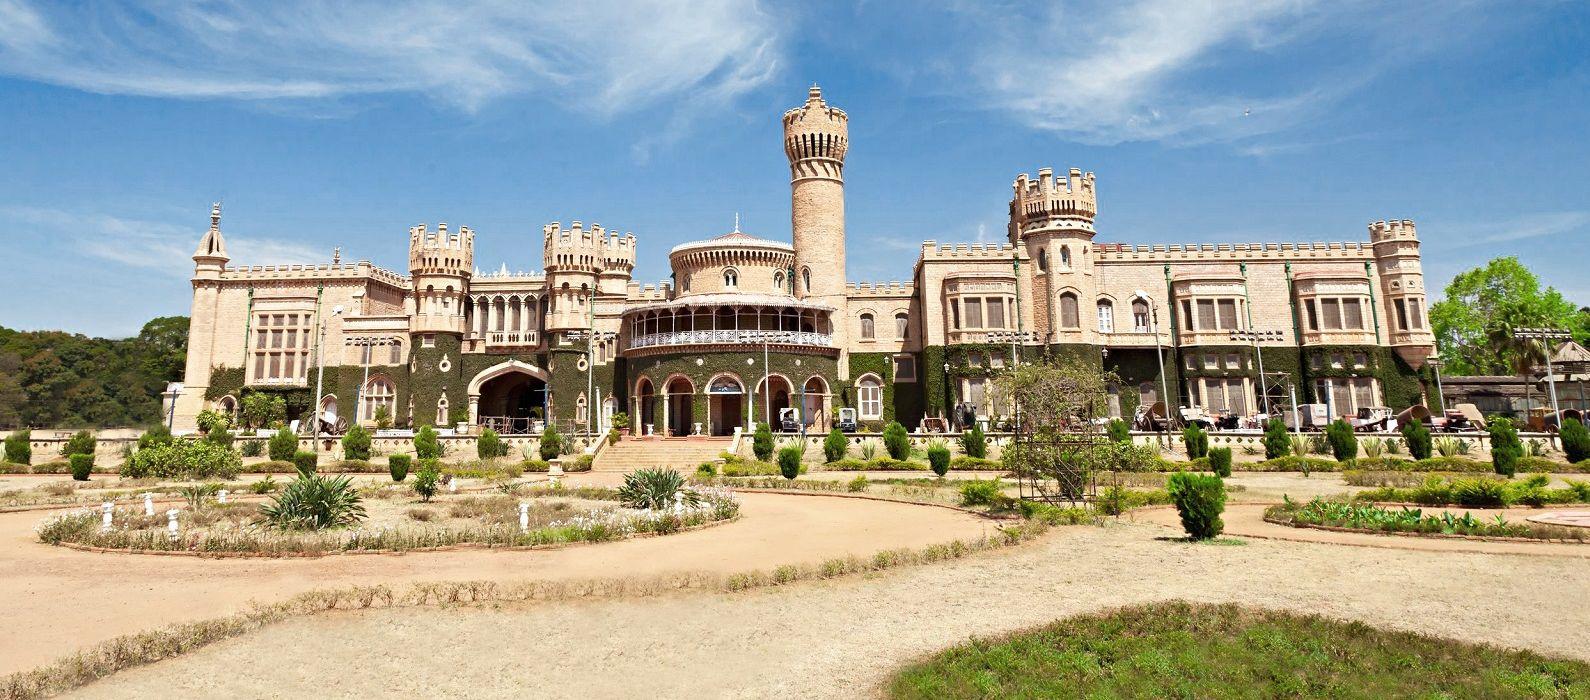 South Indian Splendor – Palace, Hills, Temples & Backwaters Tour Trip 1